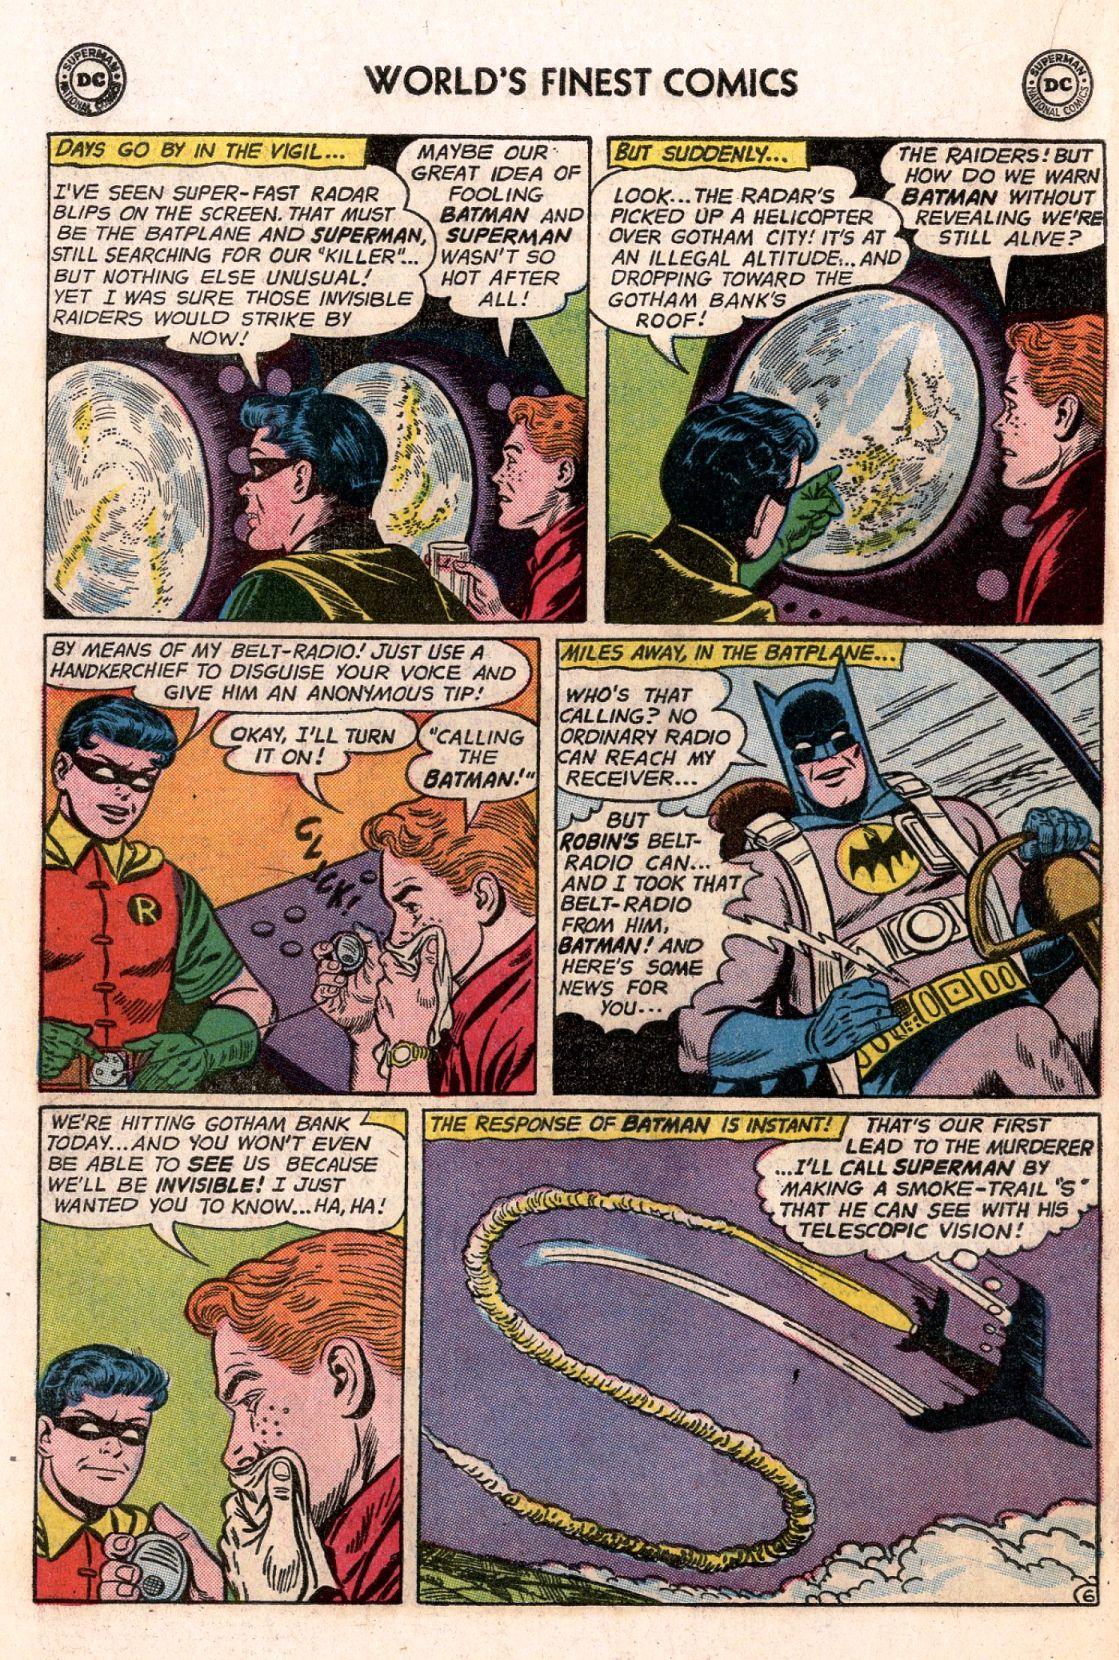 Read online World's Finest Comics comic -  Issue #141 - 18